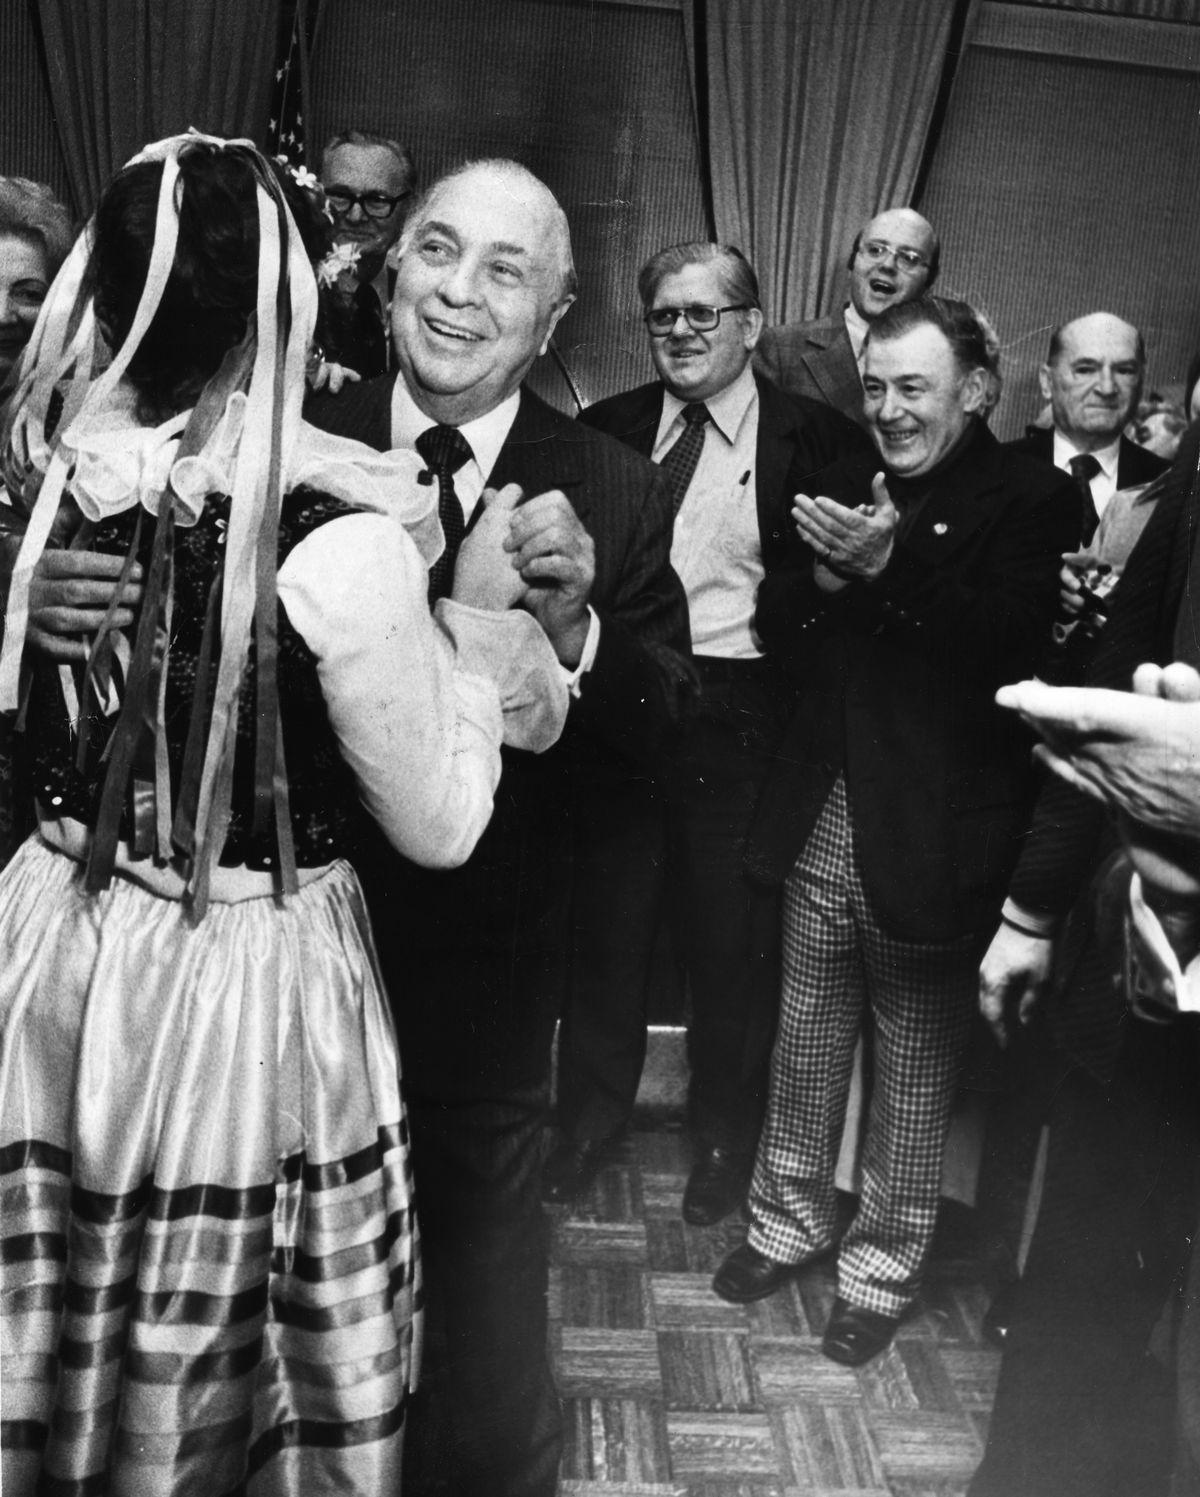 Mayor Richard J. Daley hams it up with a polka dancerat a 1975 American Polish Democratic Organization party at 6800 N. Milwaukee. | Sun-Times photo by Jack Lenahan